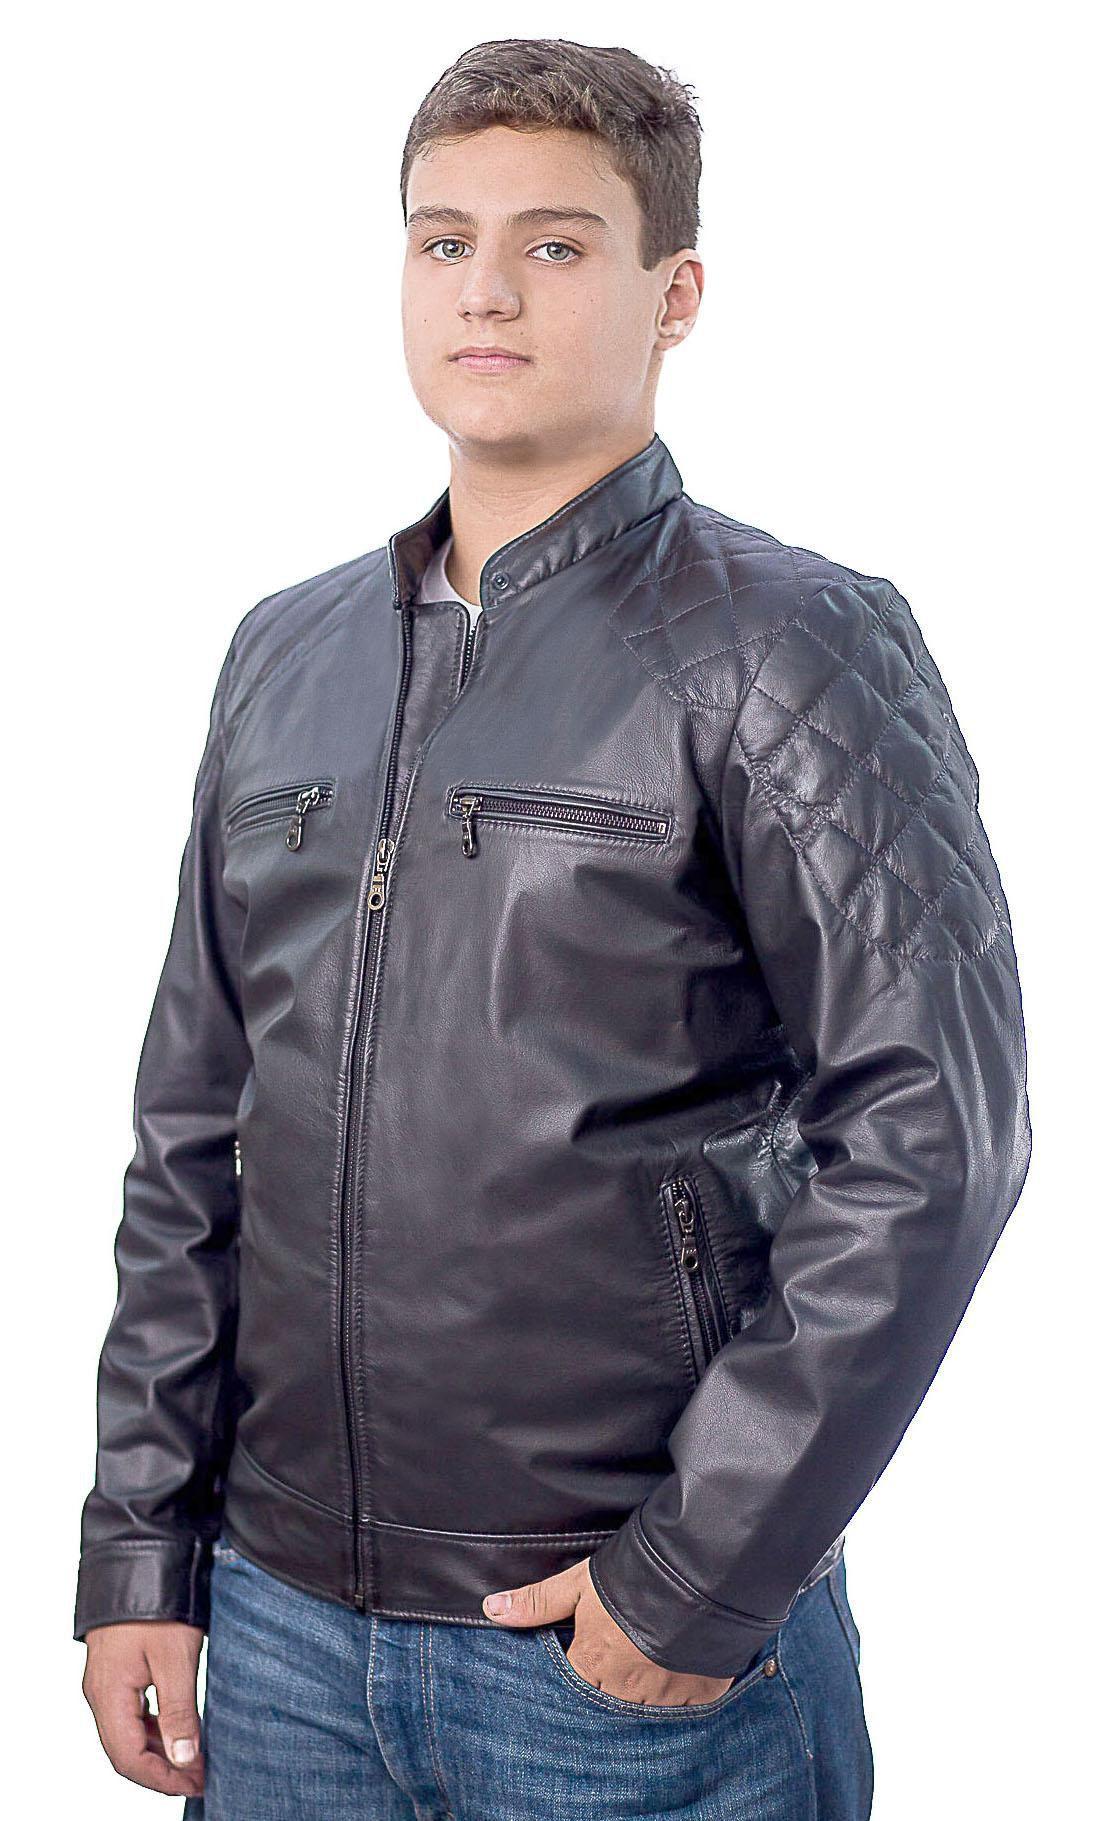 Jaqueta Masculina em Couro 356 Vest Preto